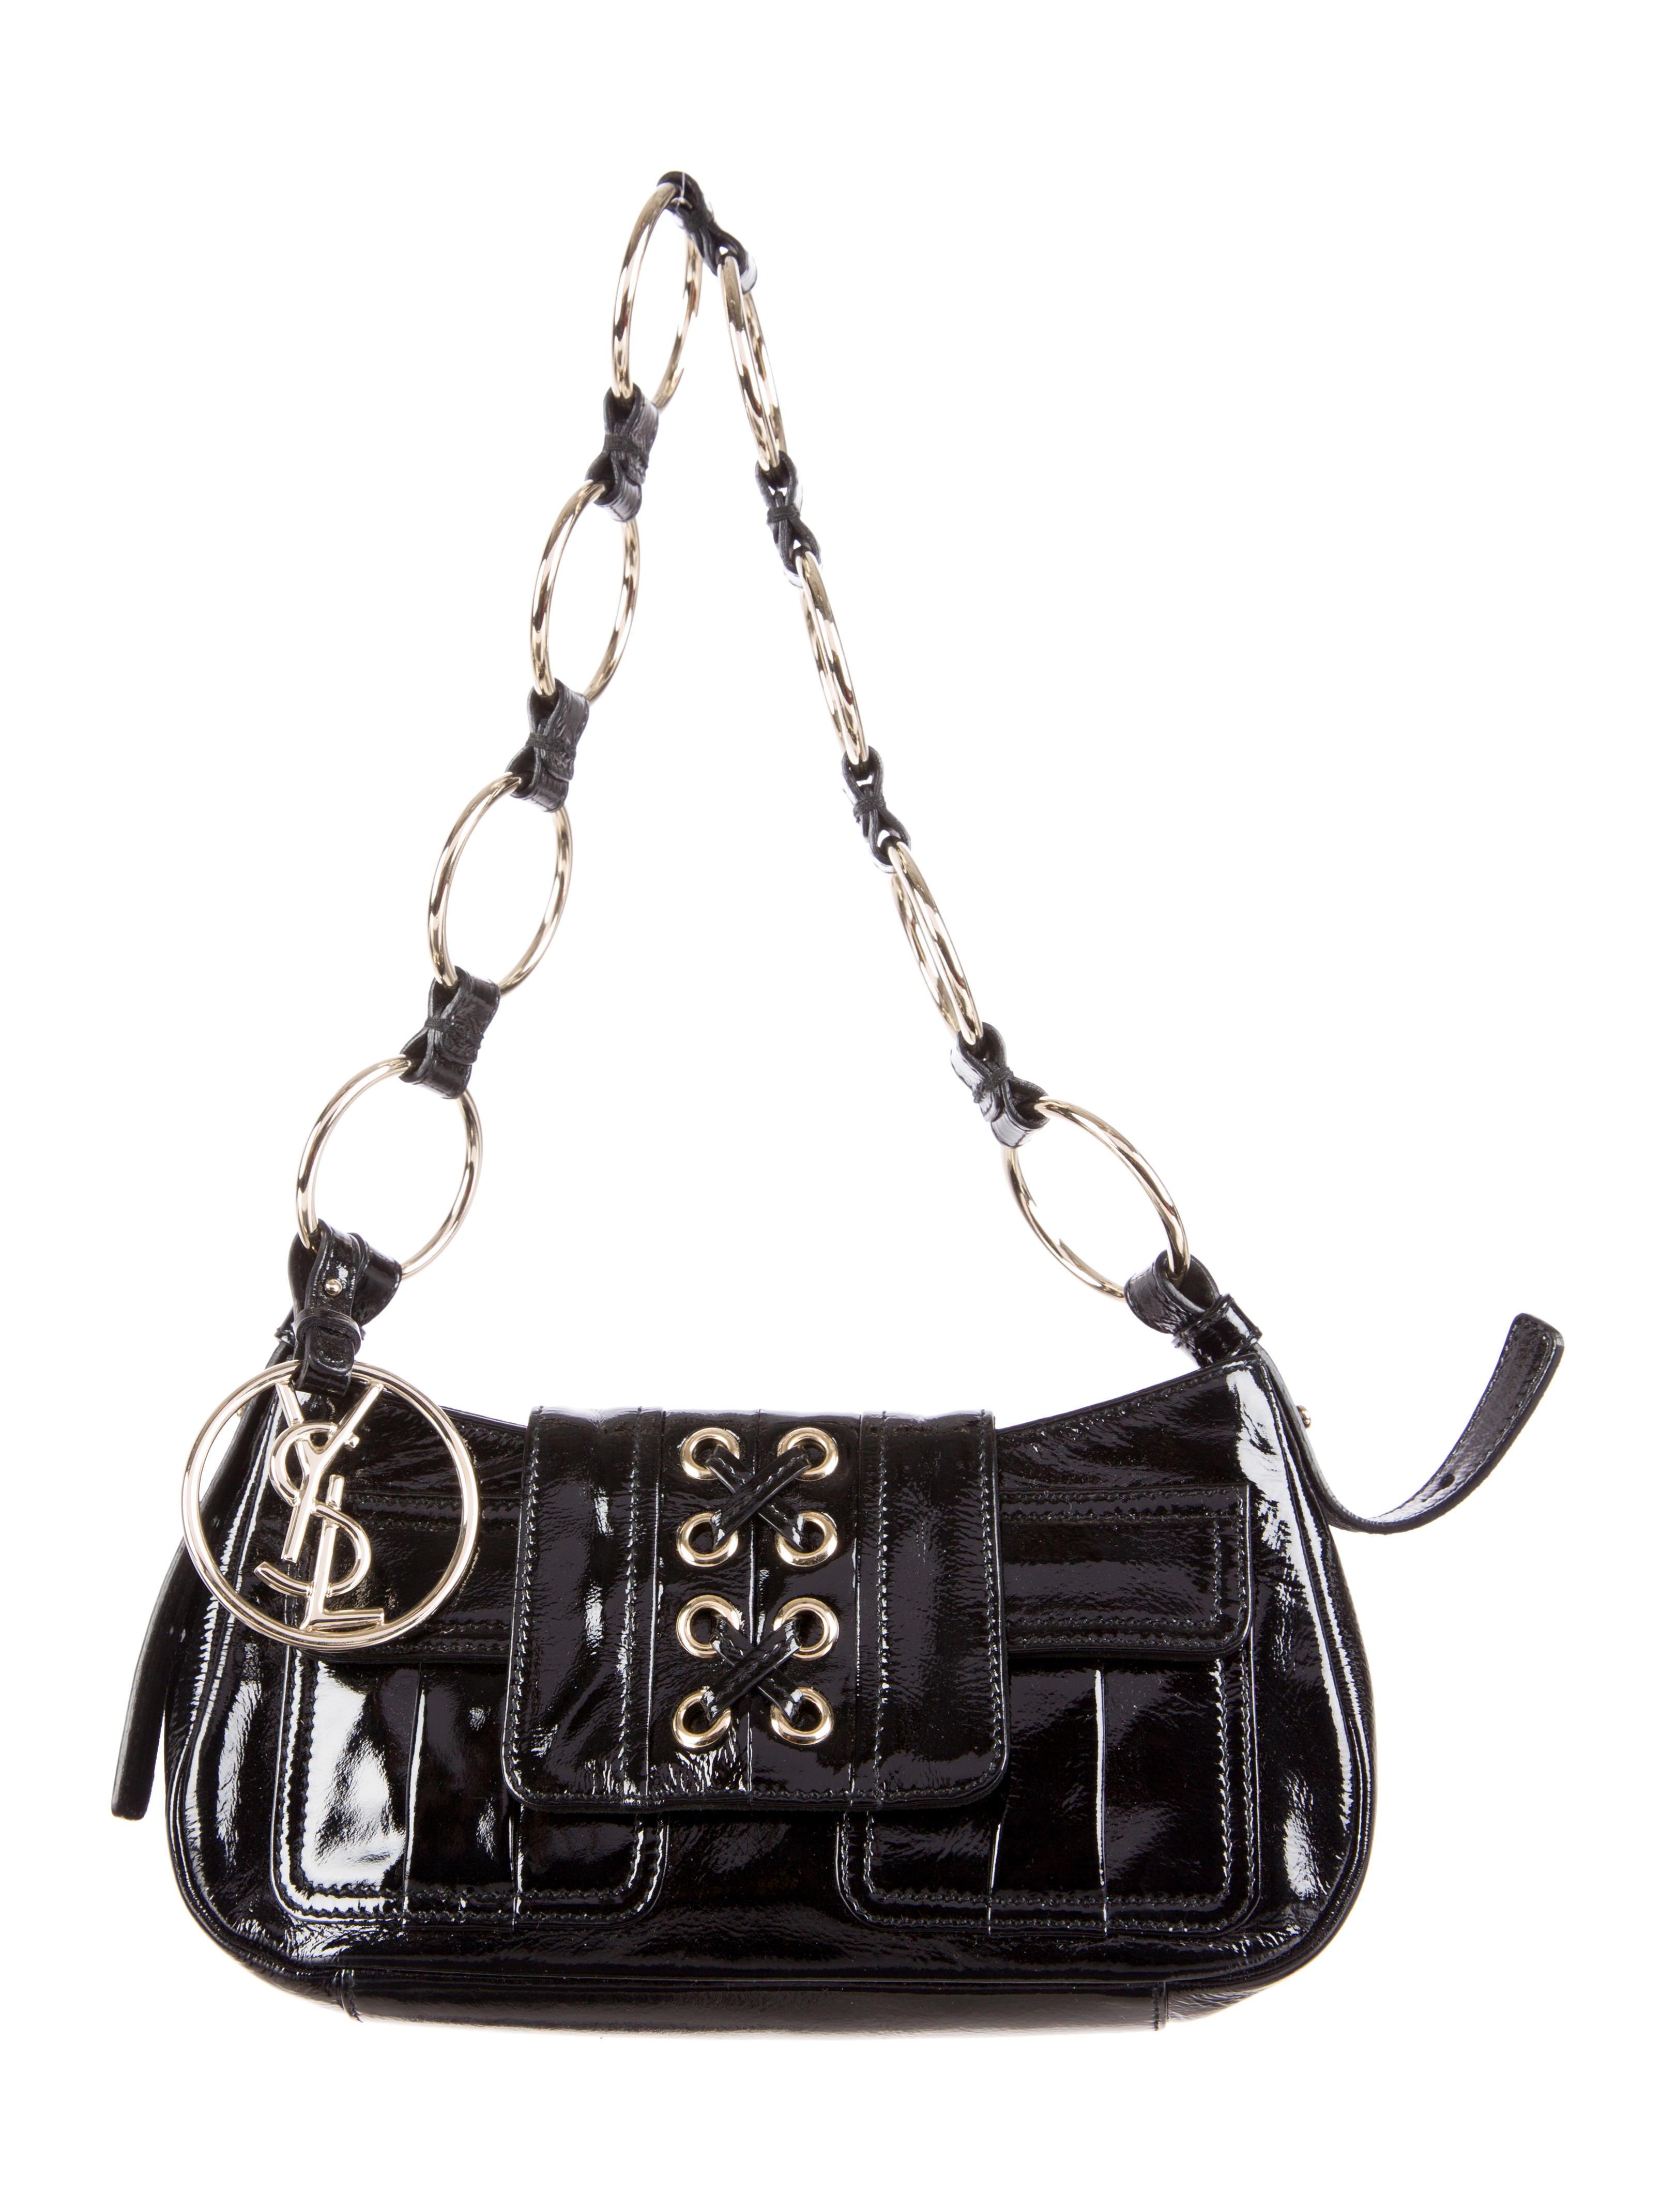 yves saint laurent bag sale ysl cabas chyc leather tote. Black Bedroom Furniture Sets. Home Design Ideas